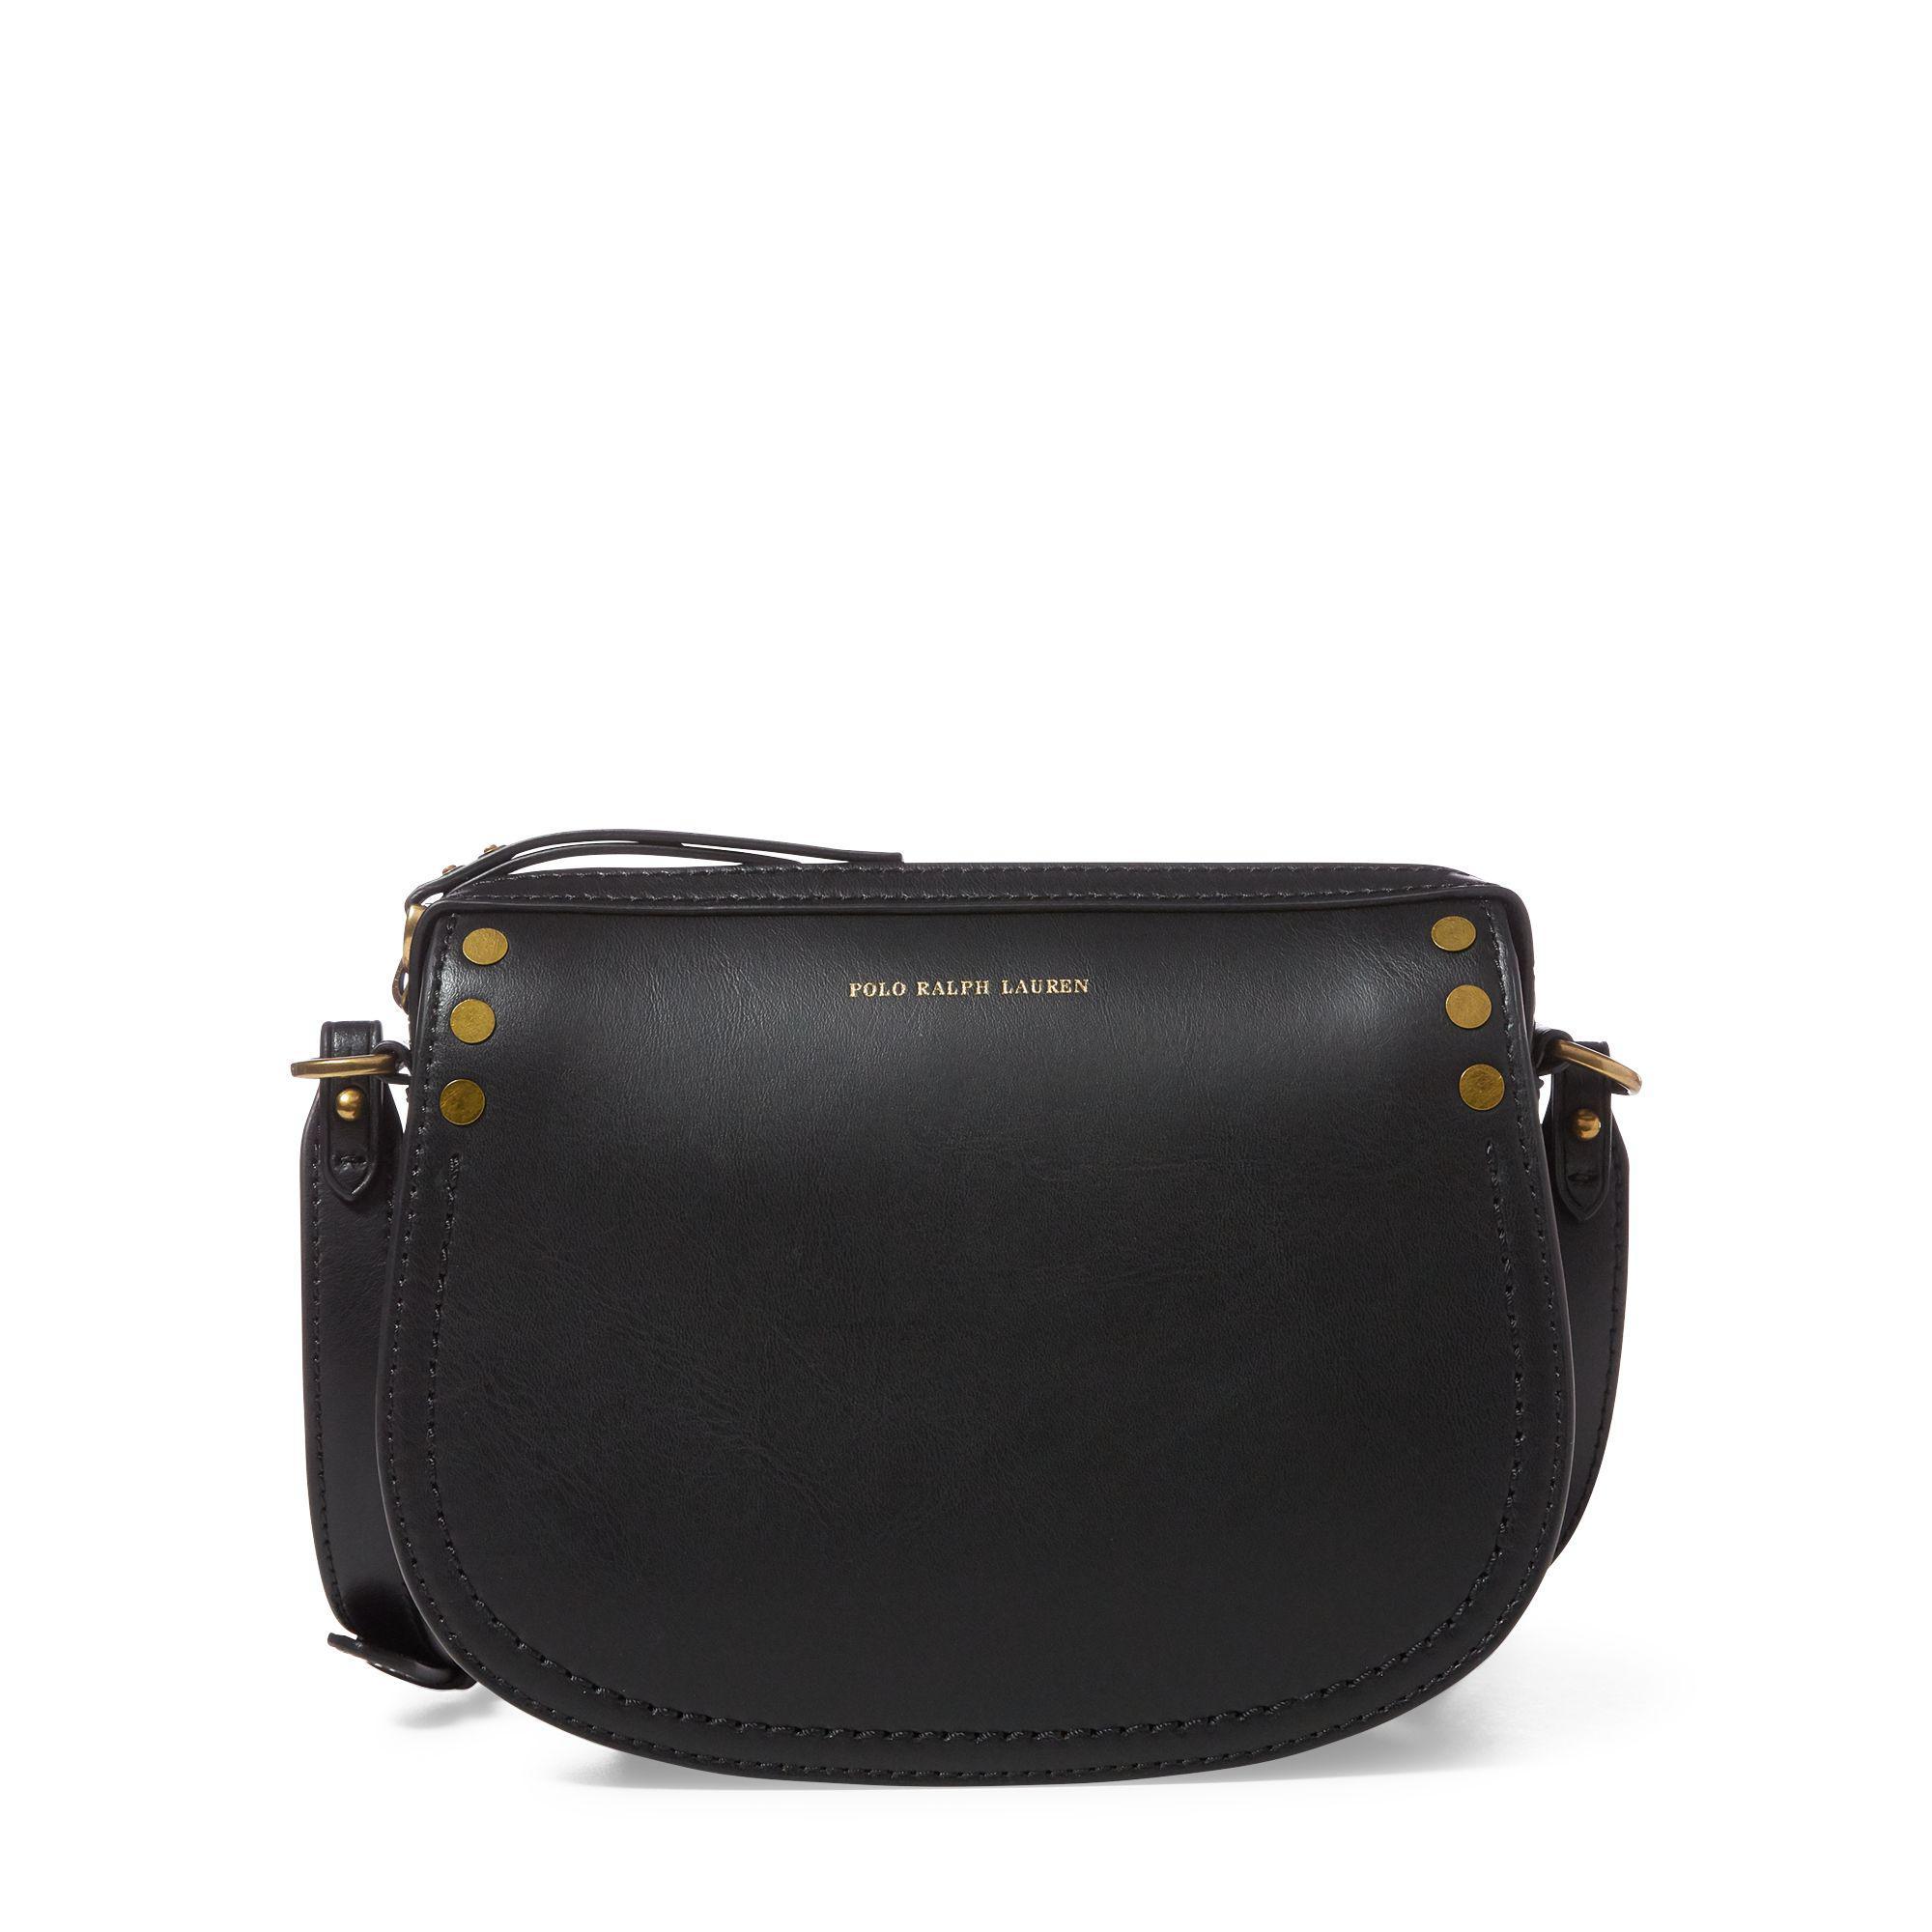 09ffc583b1 Lyst - Polo Ralph Lauren Calfskin Crossbody Bag in Black